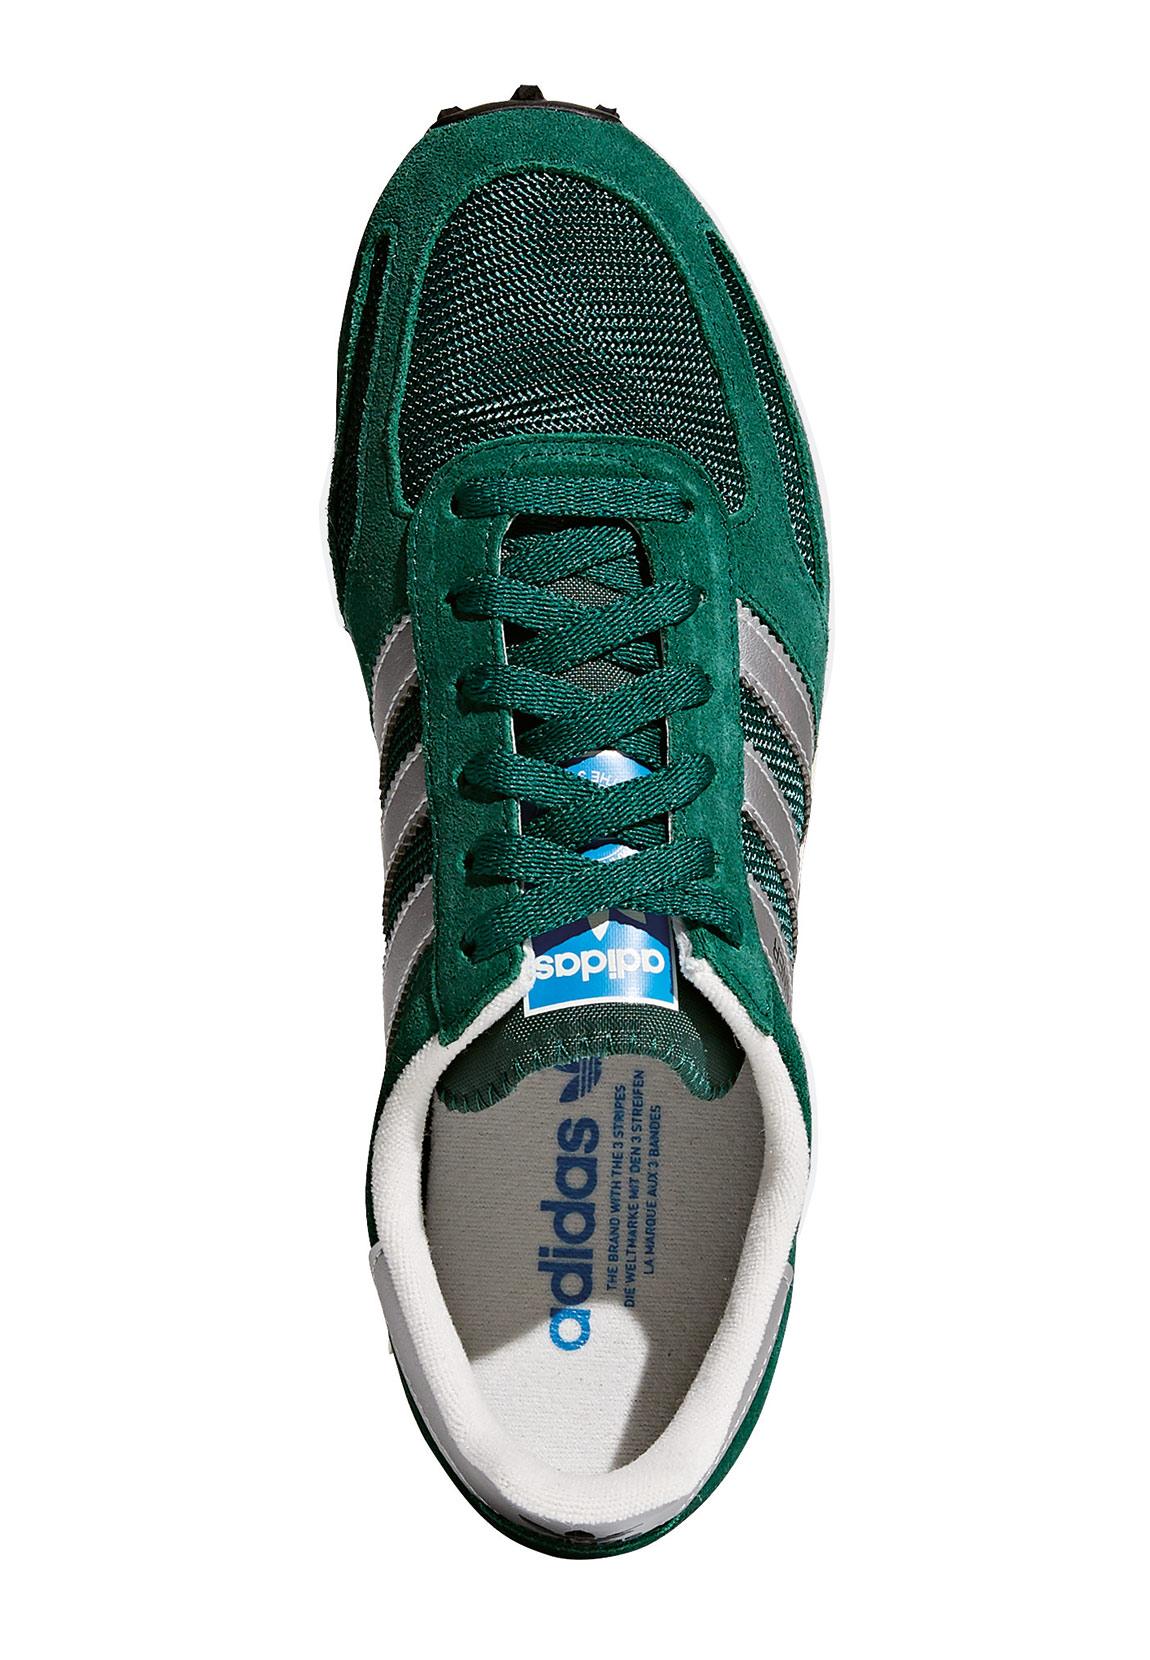 Adidas Originals Sneaker LA TRAINER OG BY9325 Grün   eBay c054df68dc